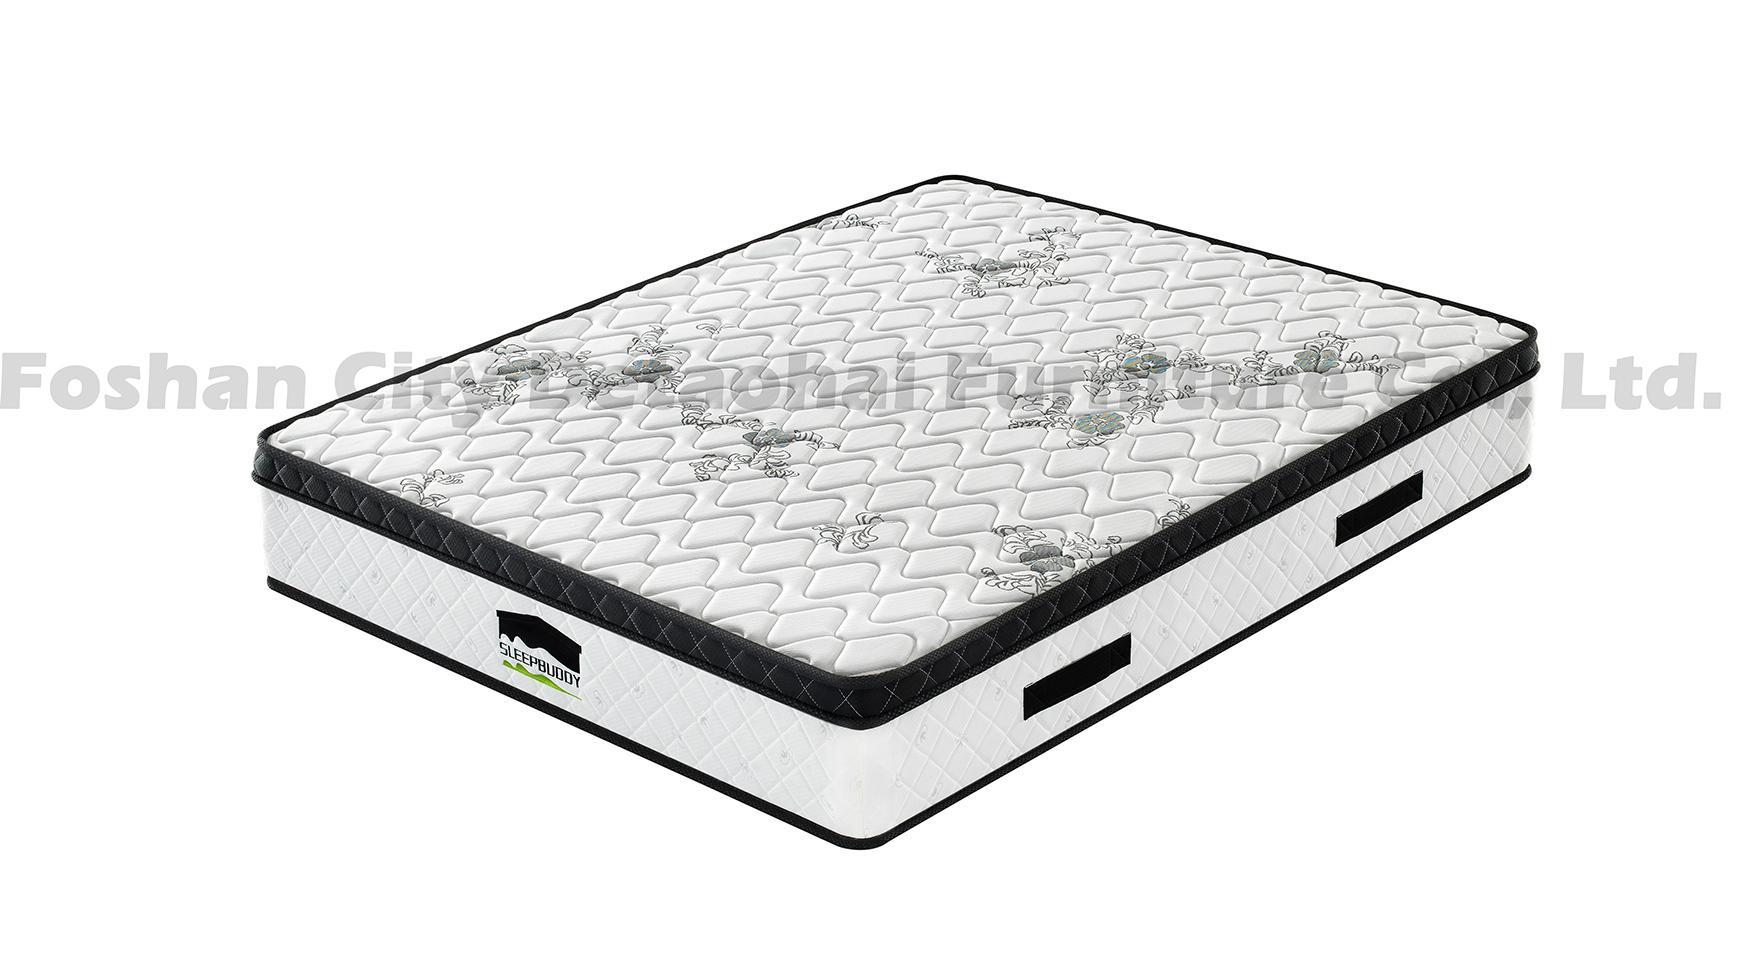 wholesales pocket spring memory foam mattress with Euro top 2